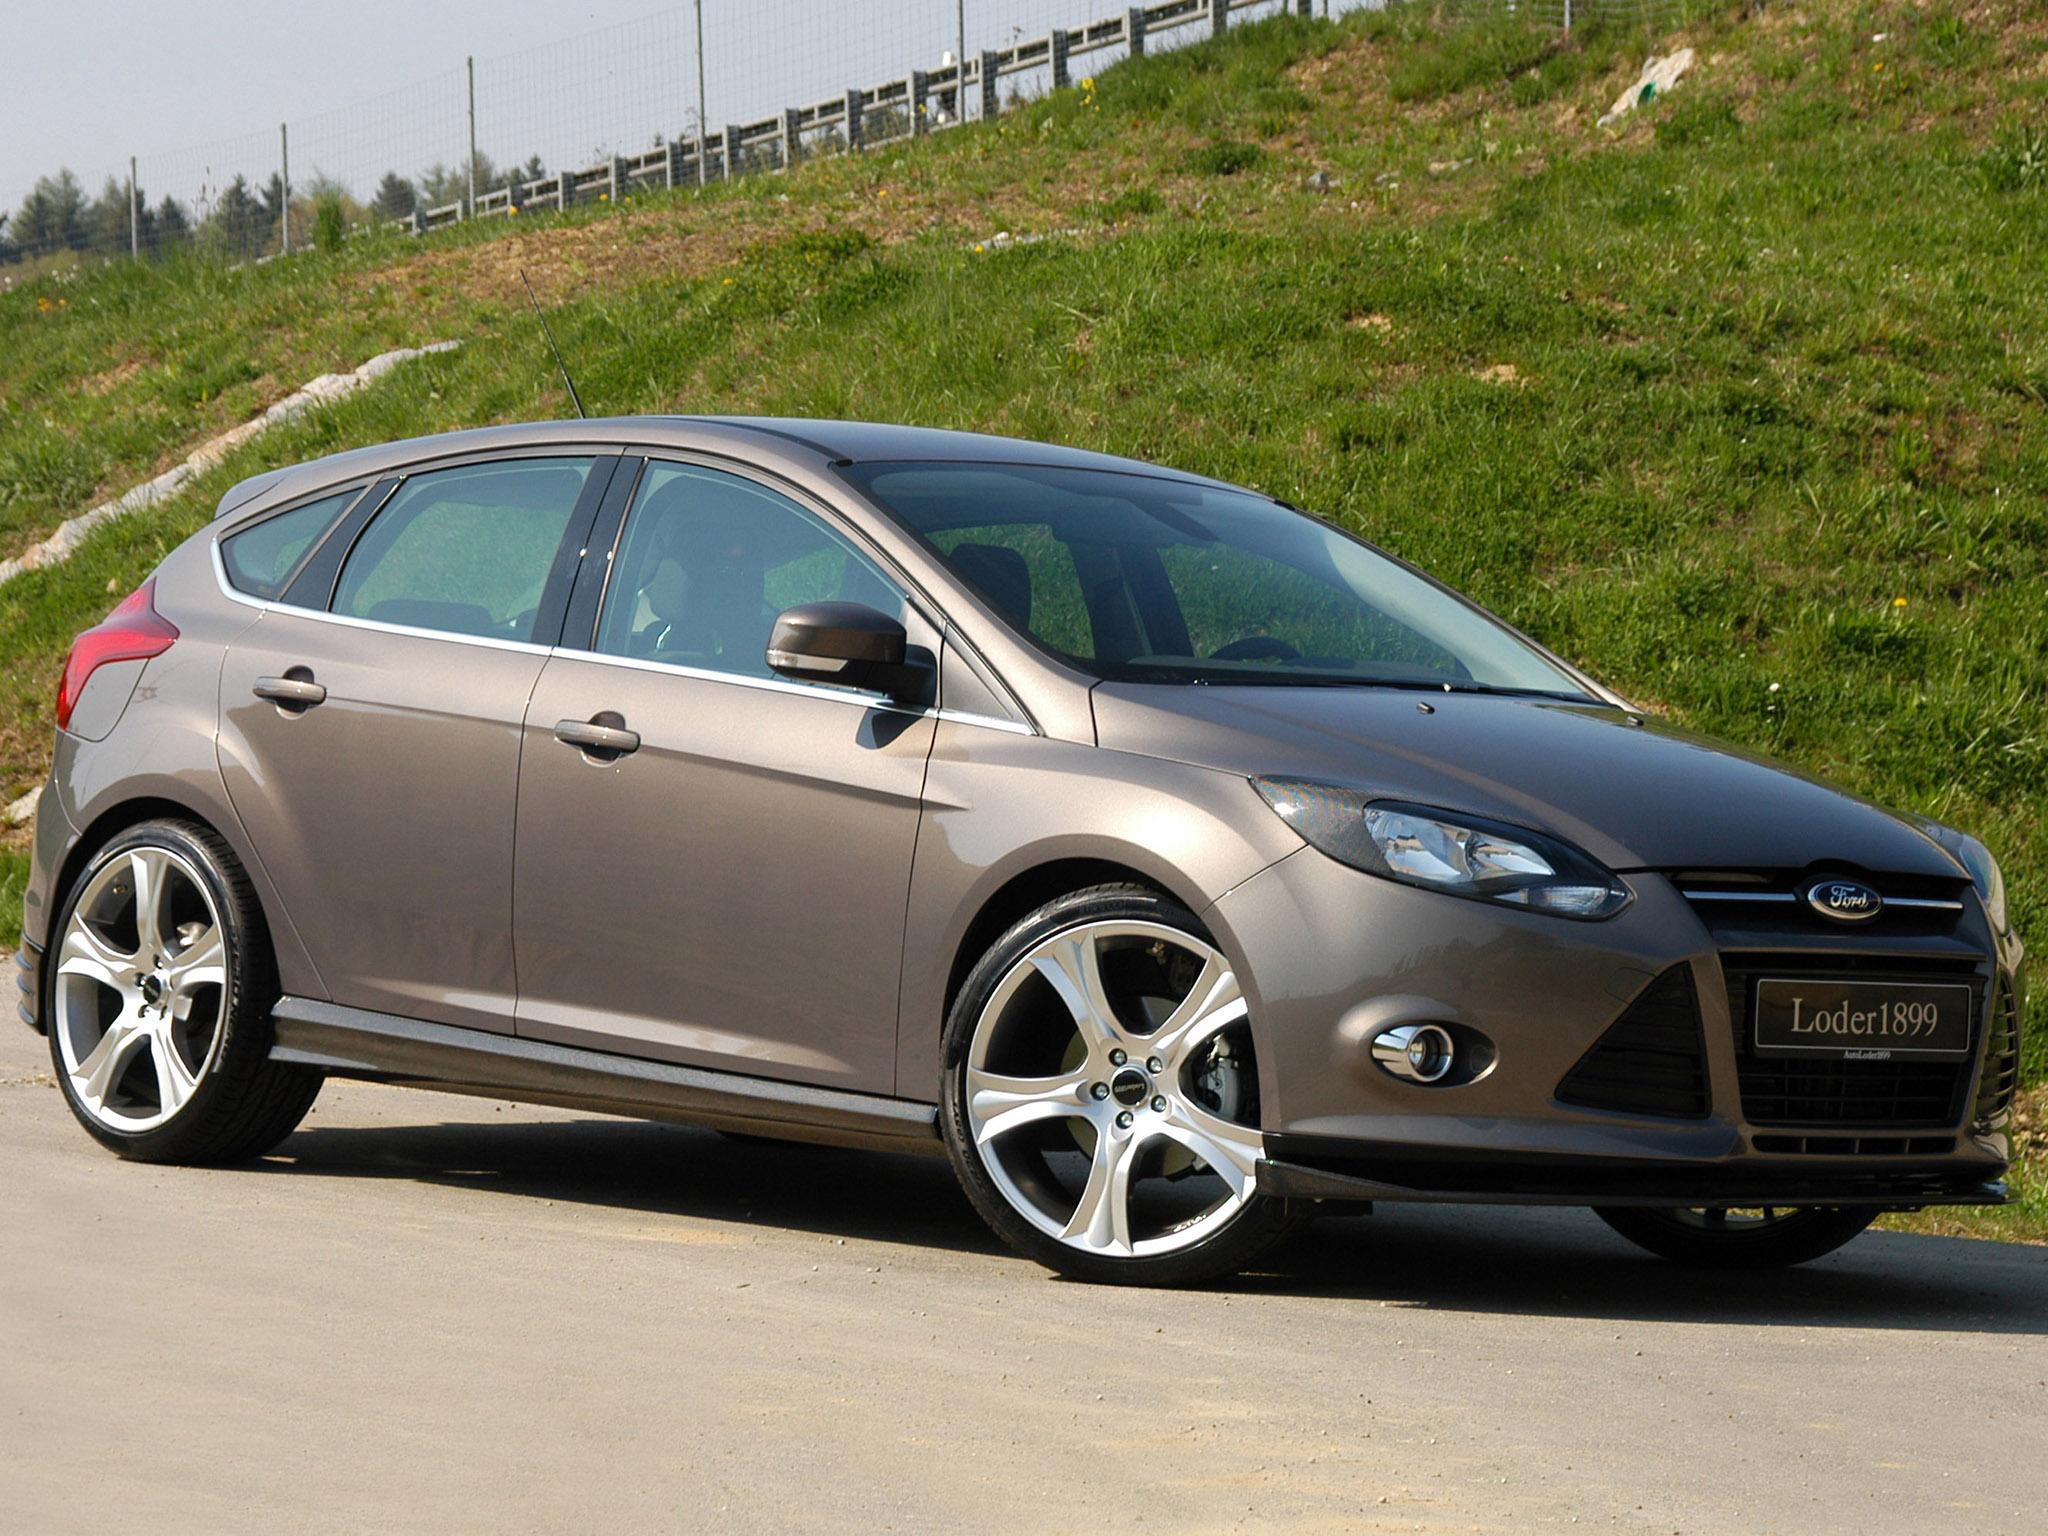 Ford focus for Automotive exterior design jobs